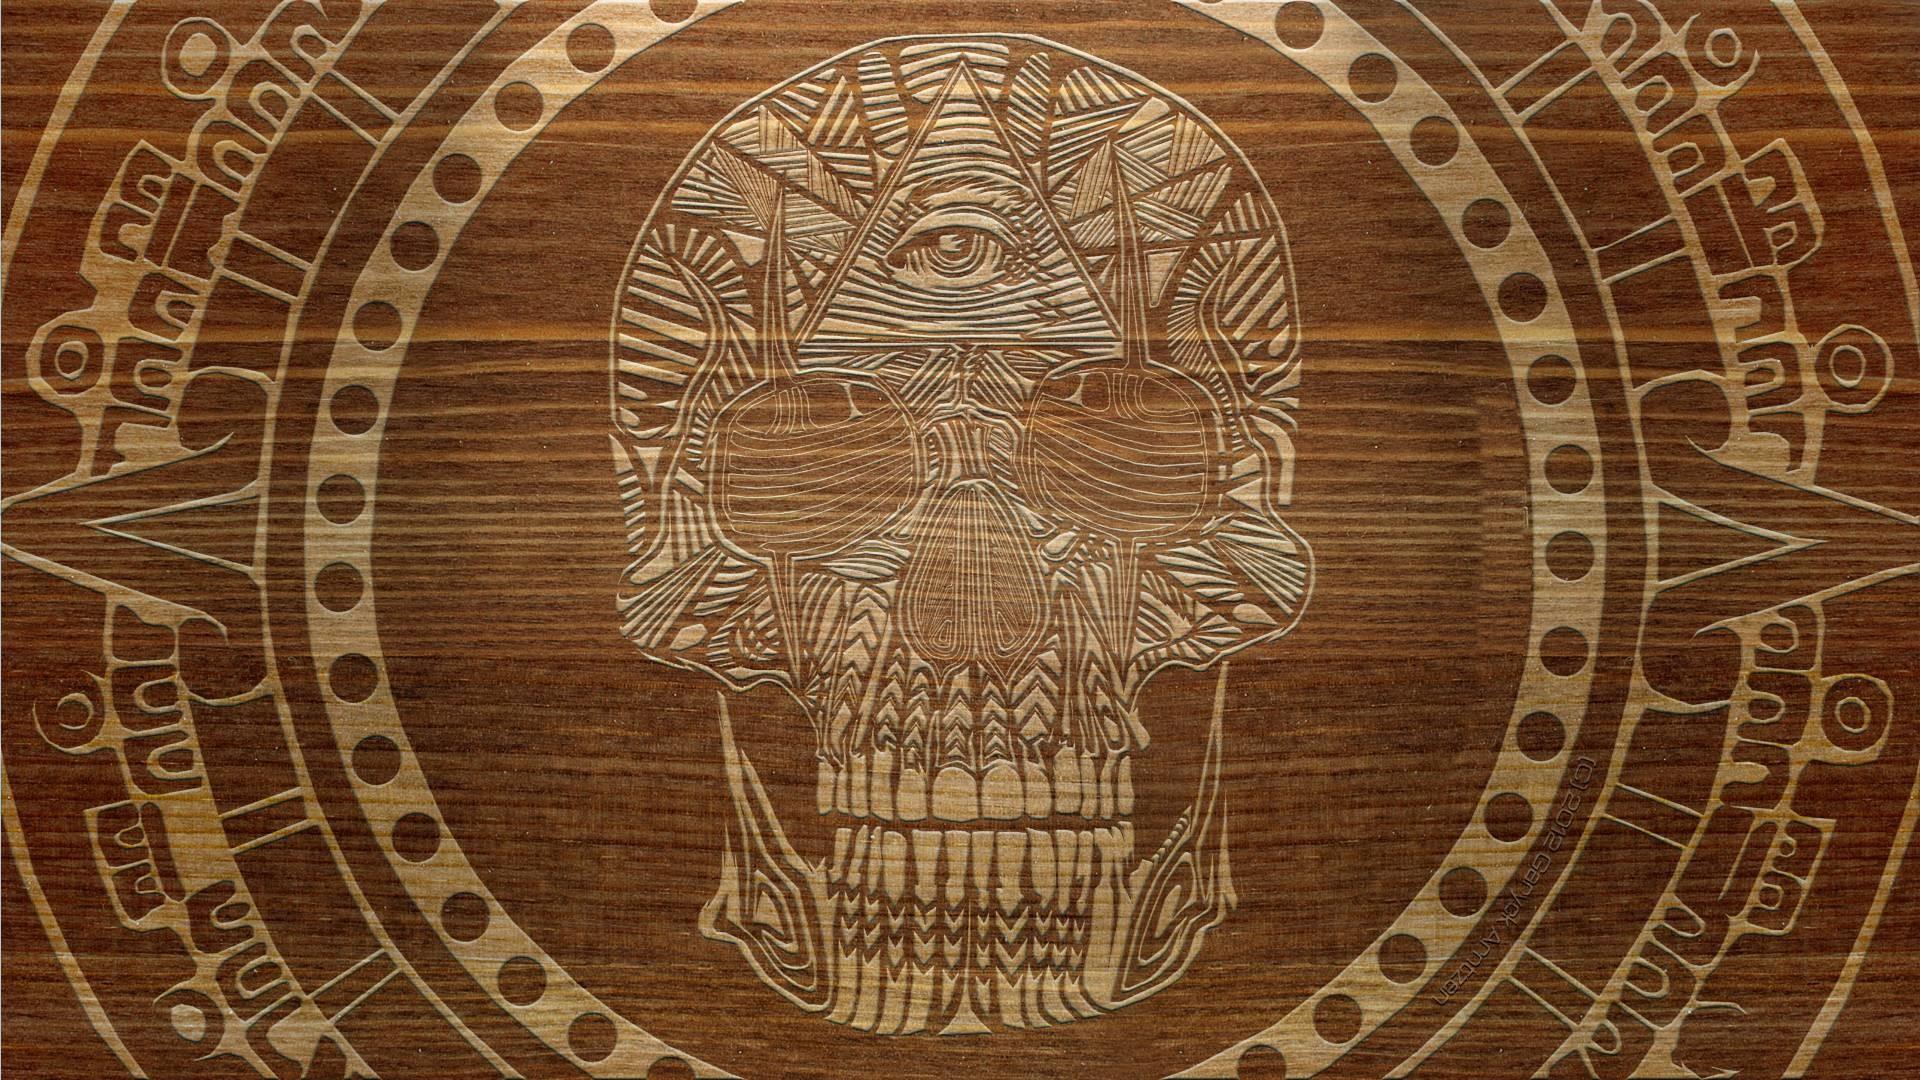 Illuminati 2013 wallpaper | High Quality Wallpapers,Wallpaper .